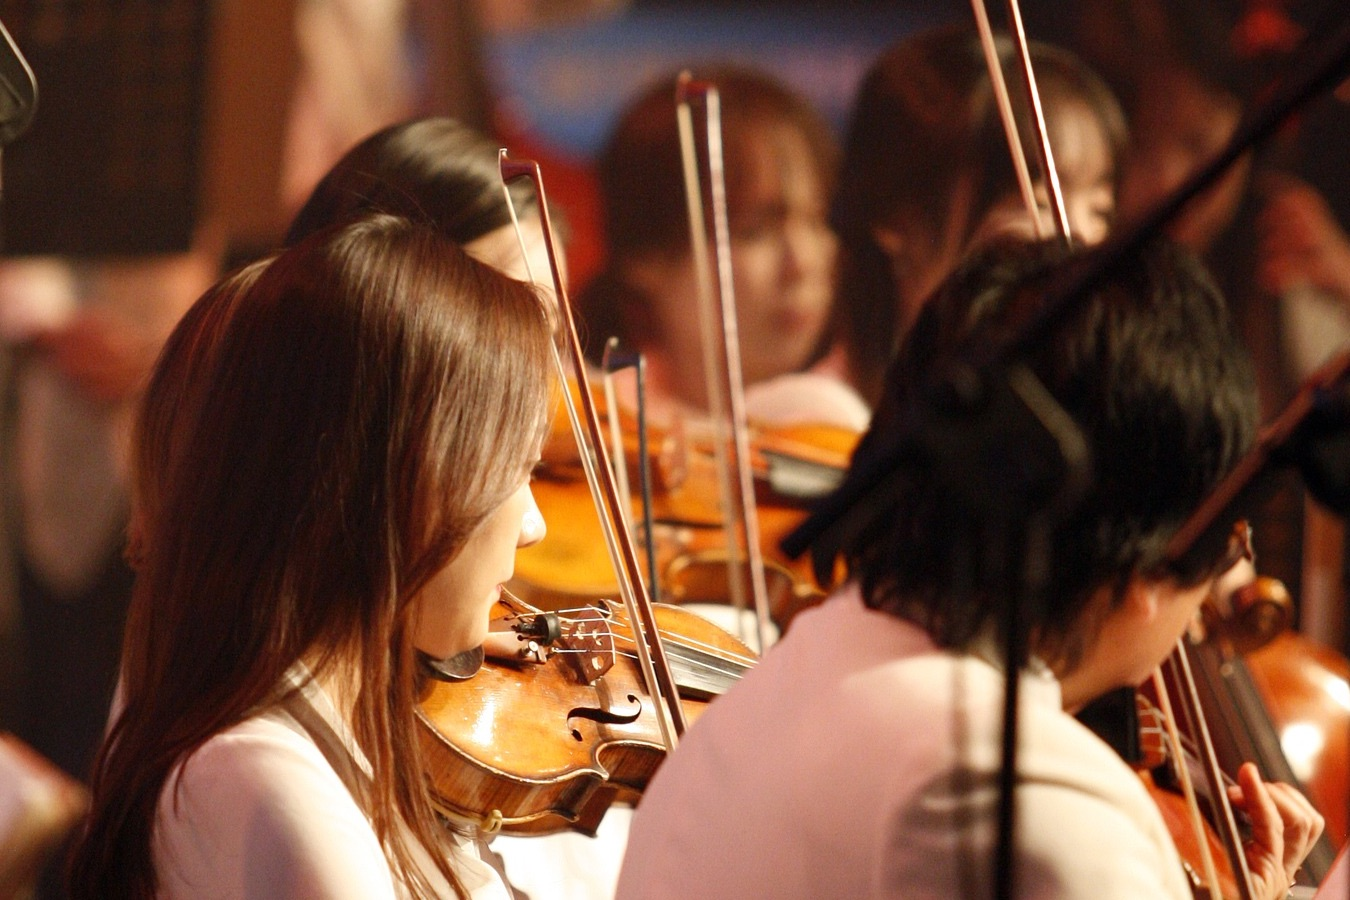 Flitzebögen Schulprojekt Montessorischule Reumontstrasse - music loft | Freie Musikschule Aachen